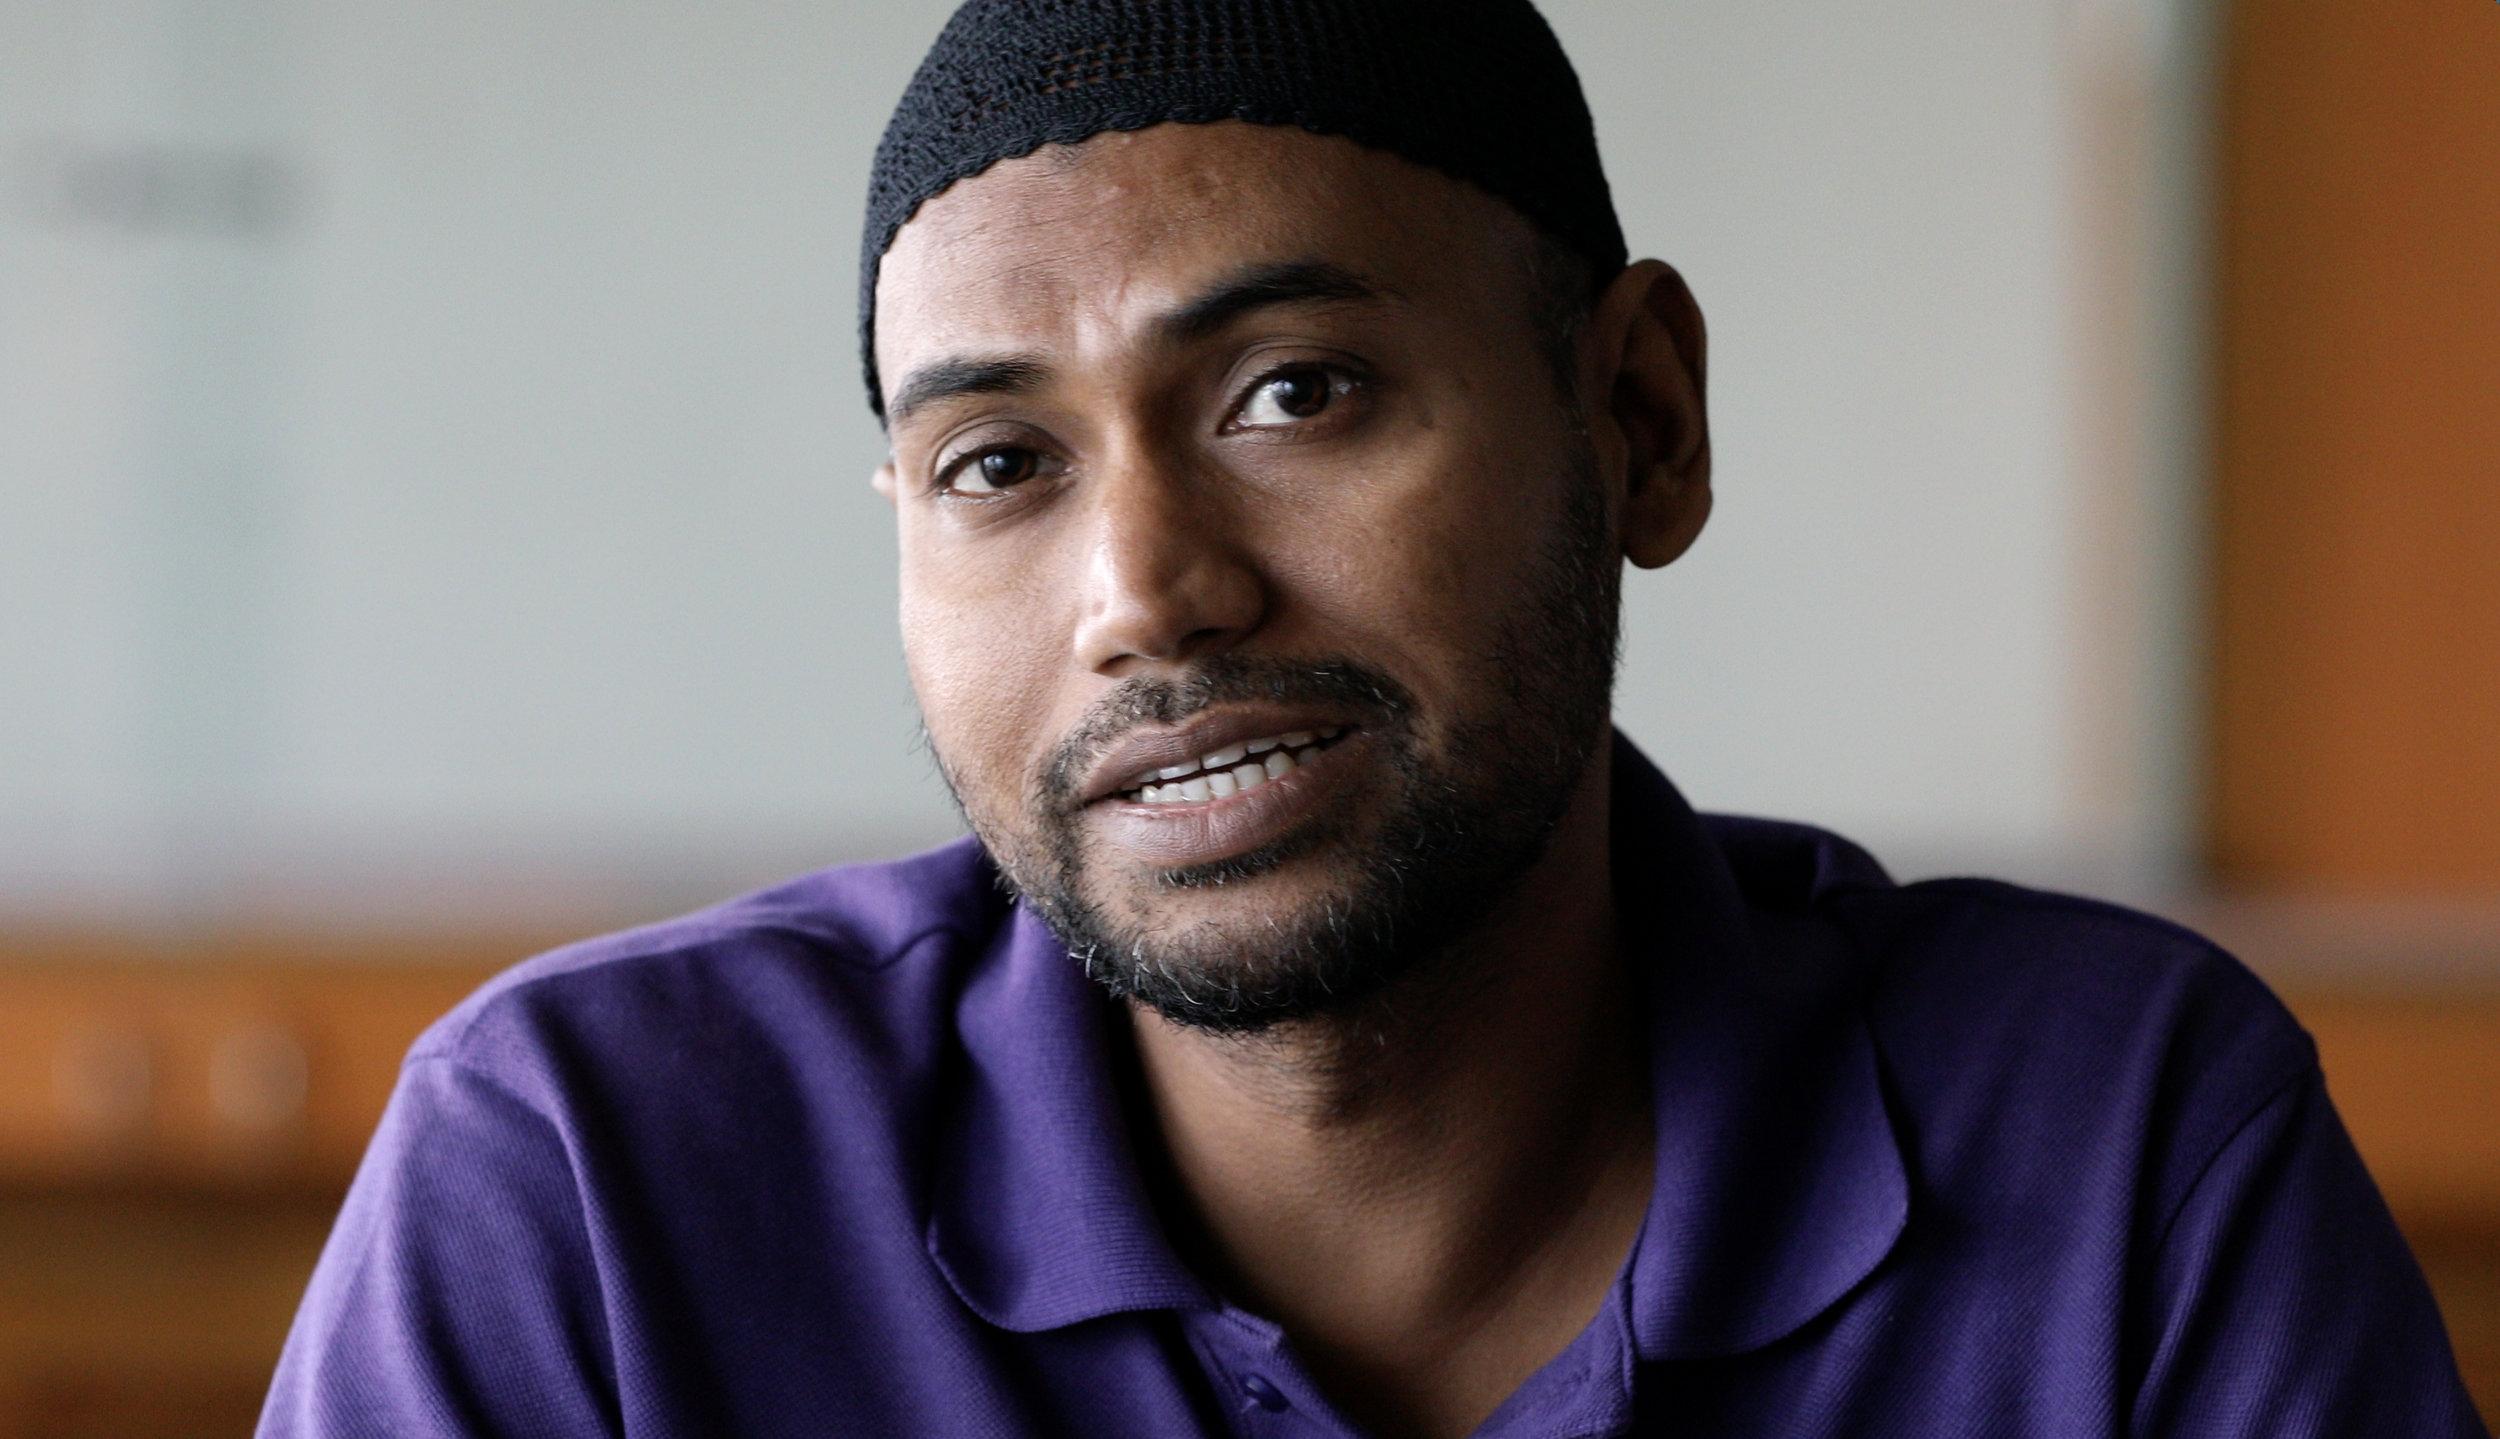 Dr. Atikul Islam